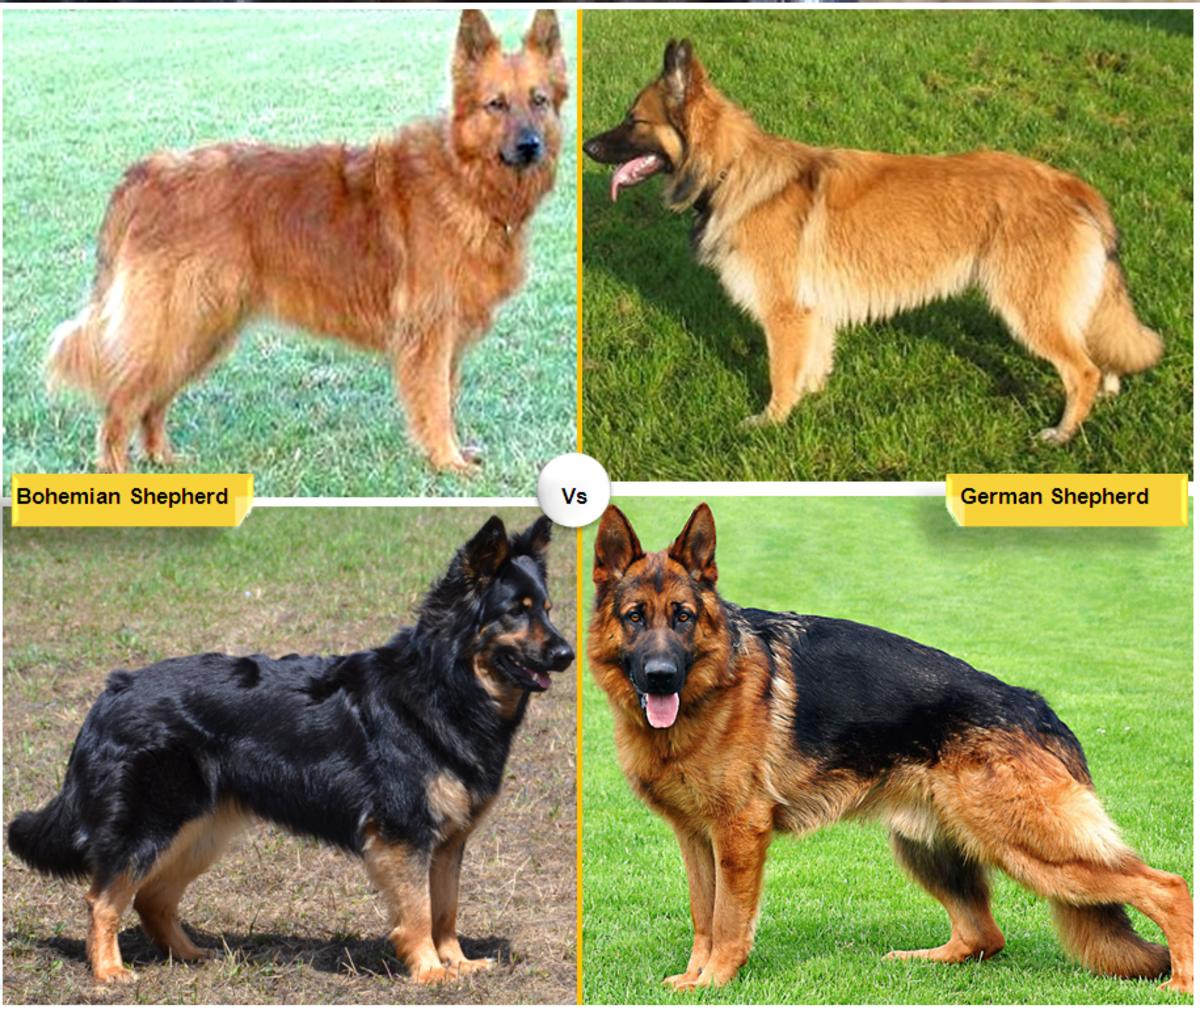 Bohemian Shepherd vs. German Shepherd